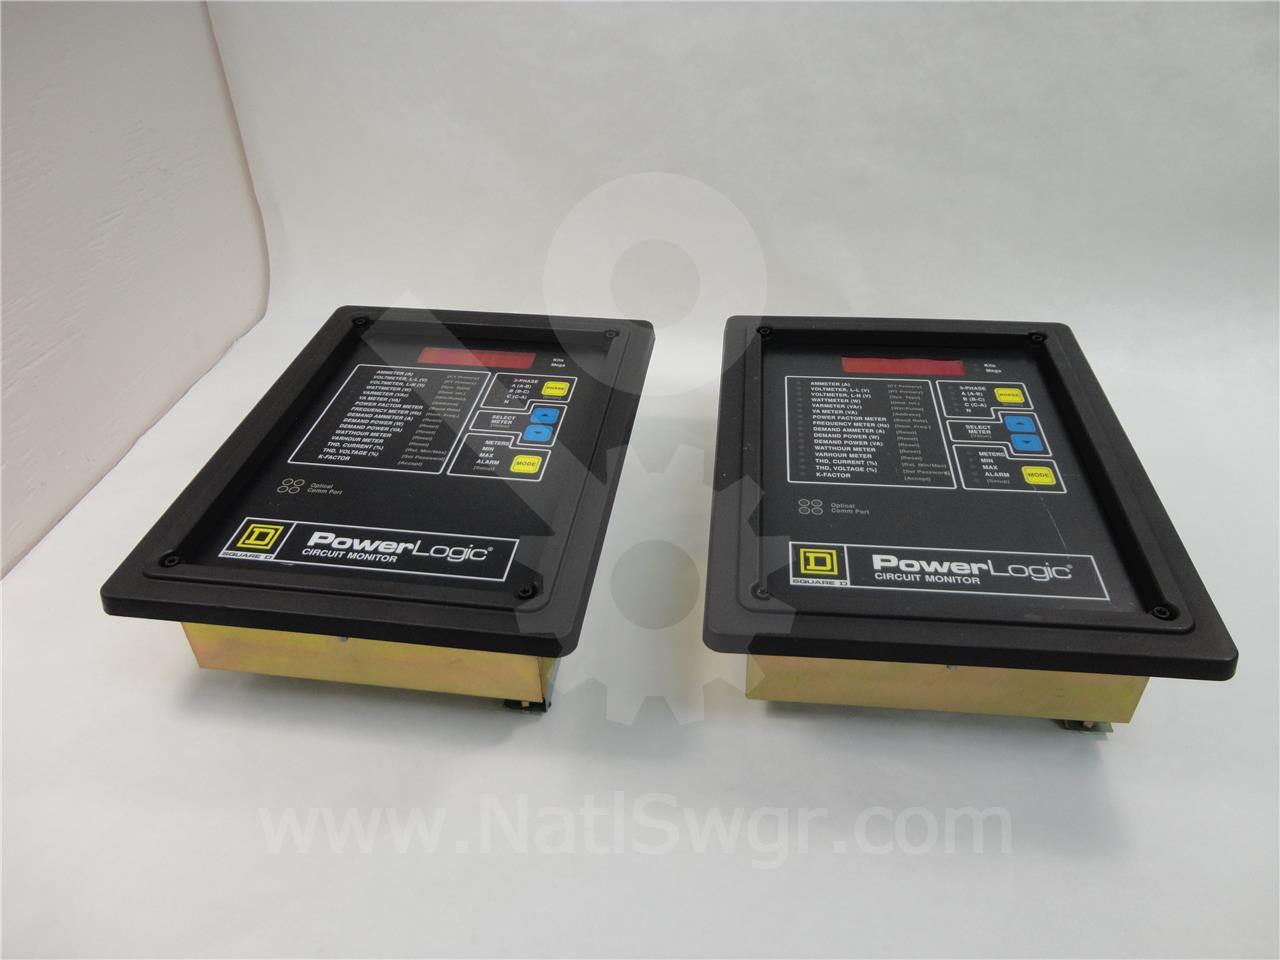 Square D Sqd Powerlogic Cm 2150 Circuit Monitor